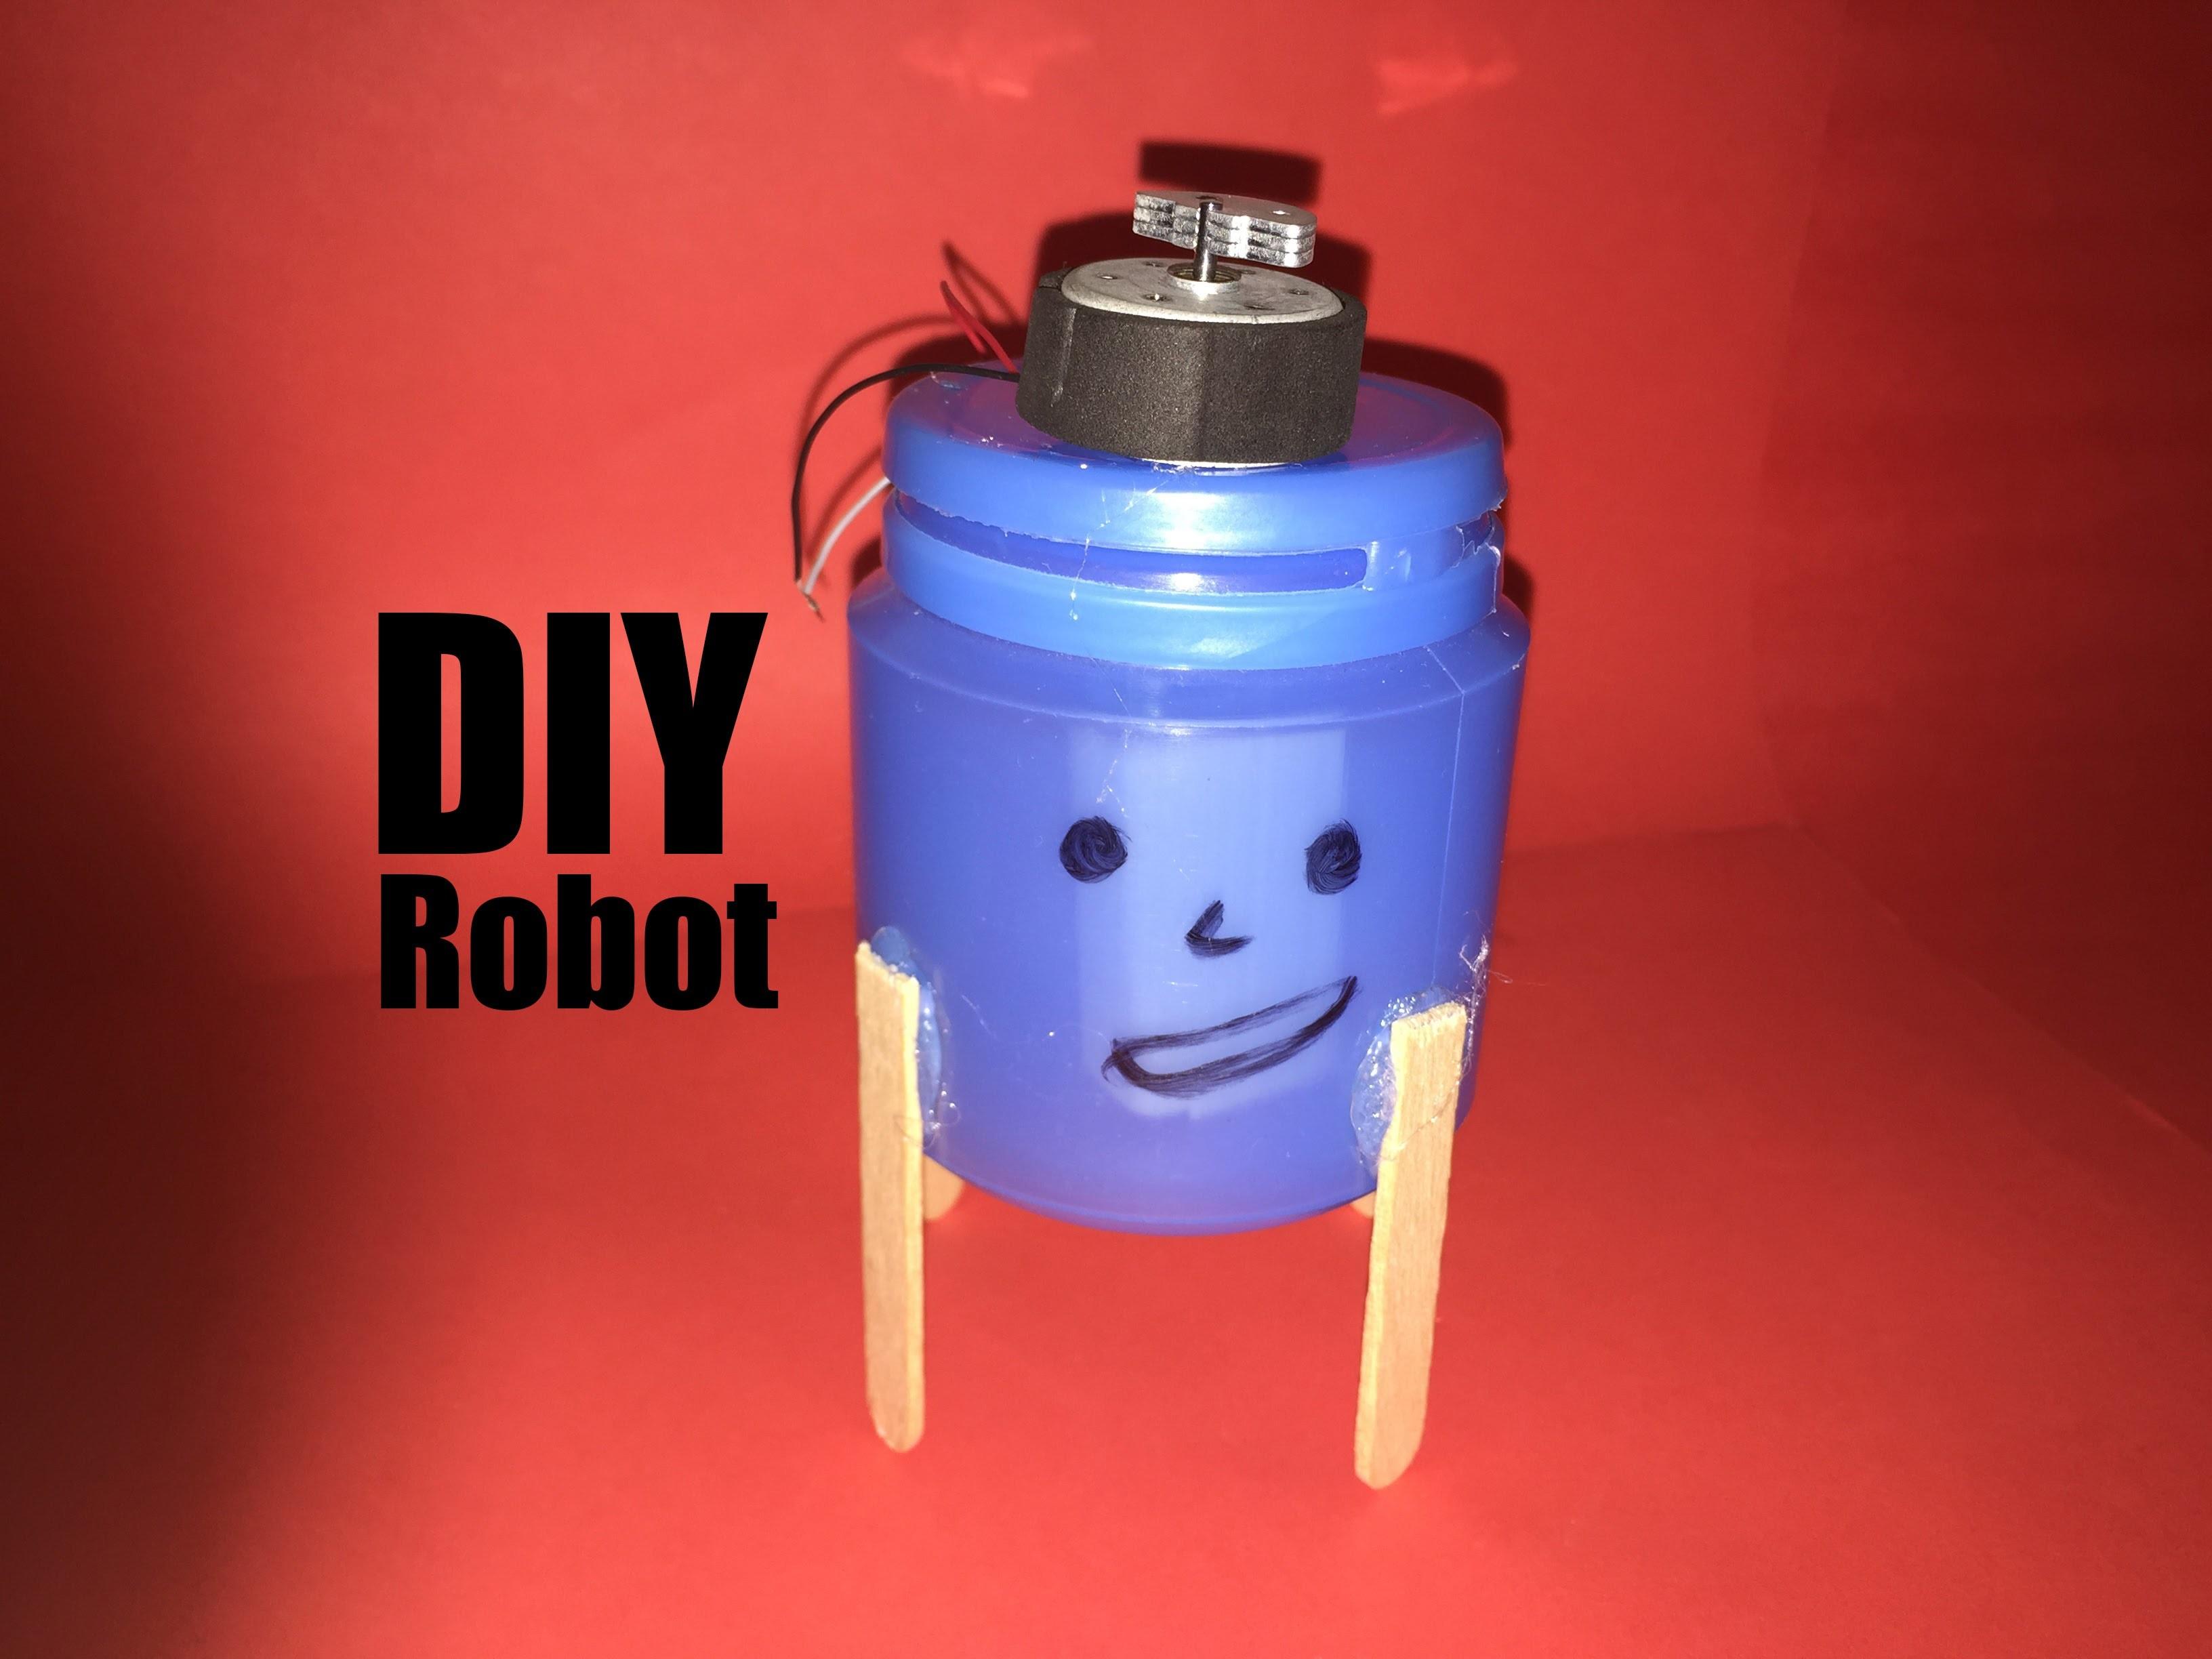 How to Make a Toy Robot - DIY Robot